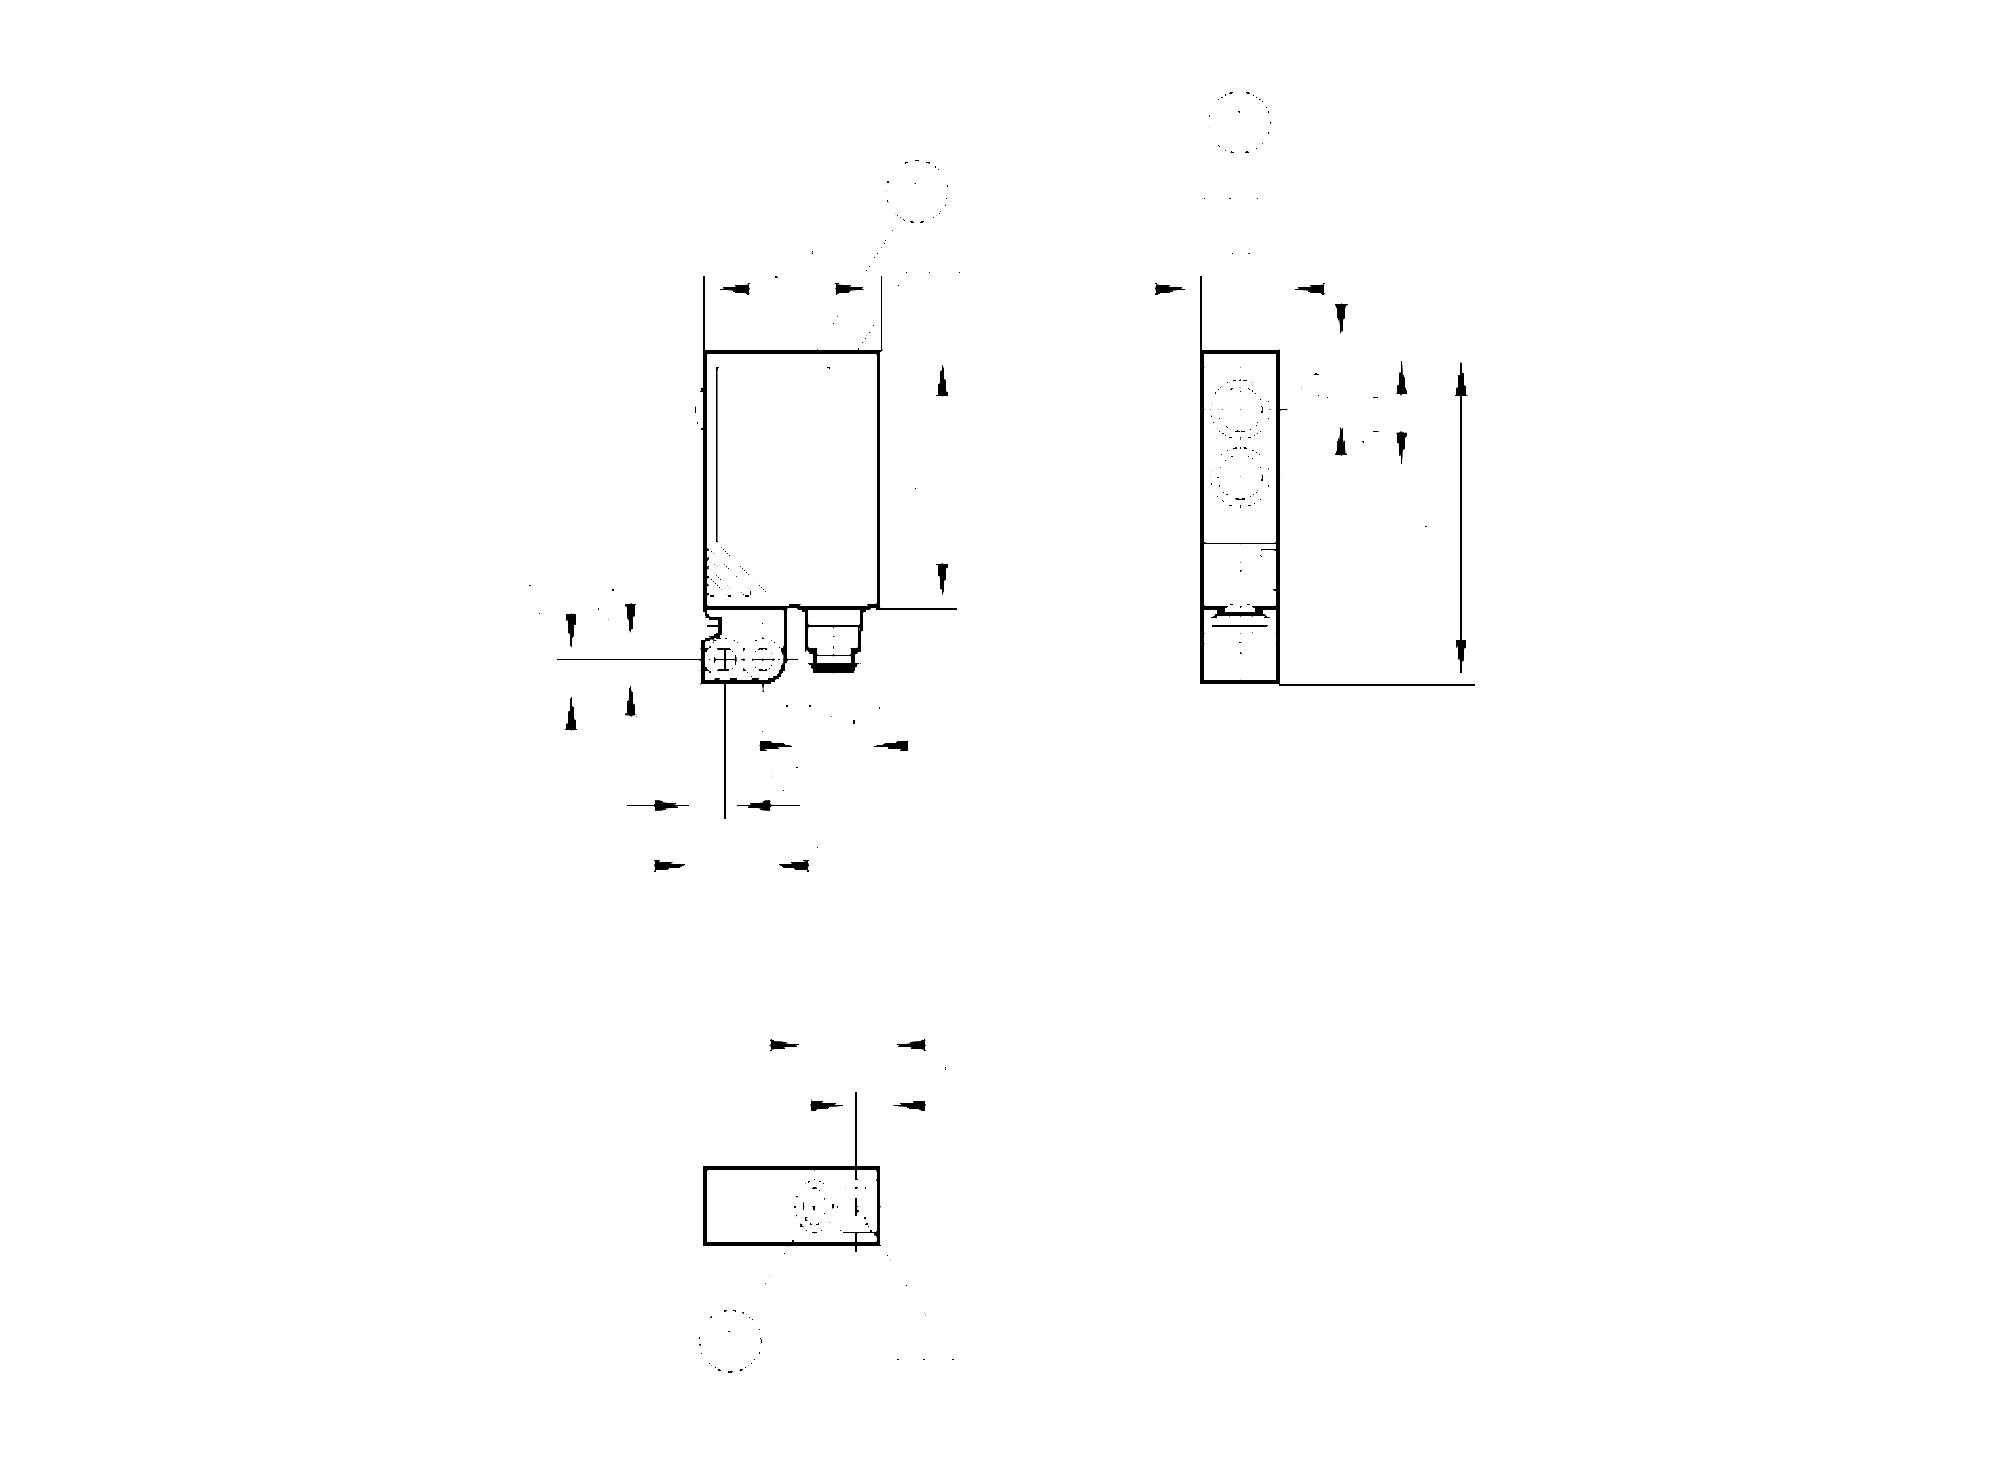 oj5022 - diffuse reflection sensor